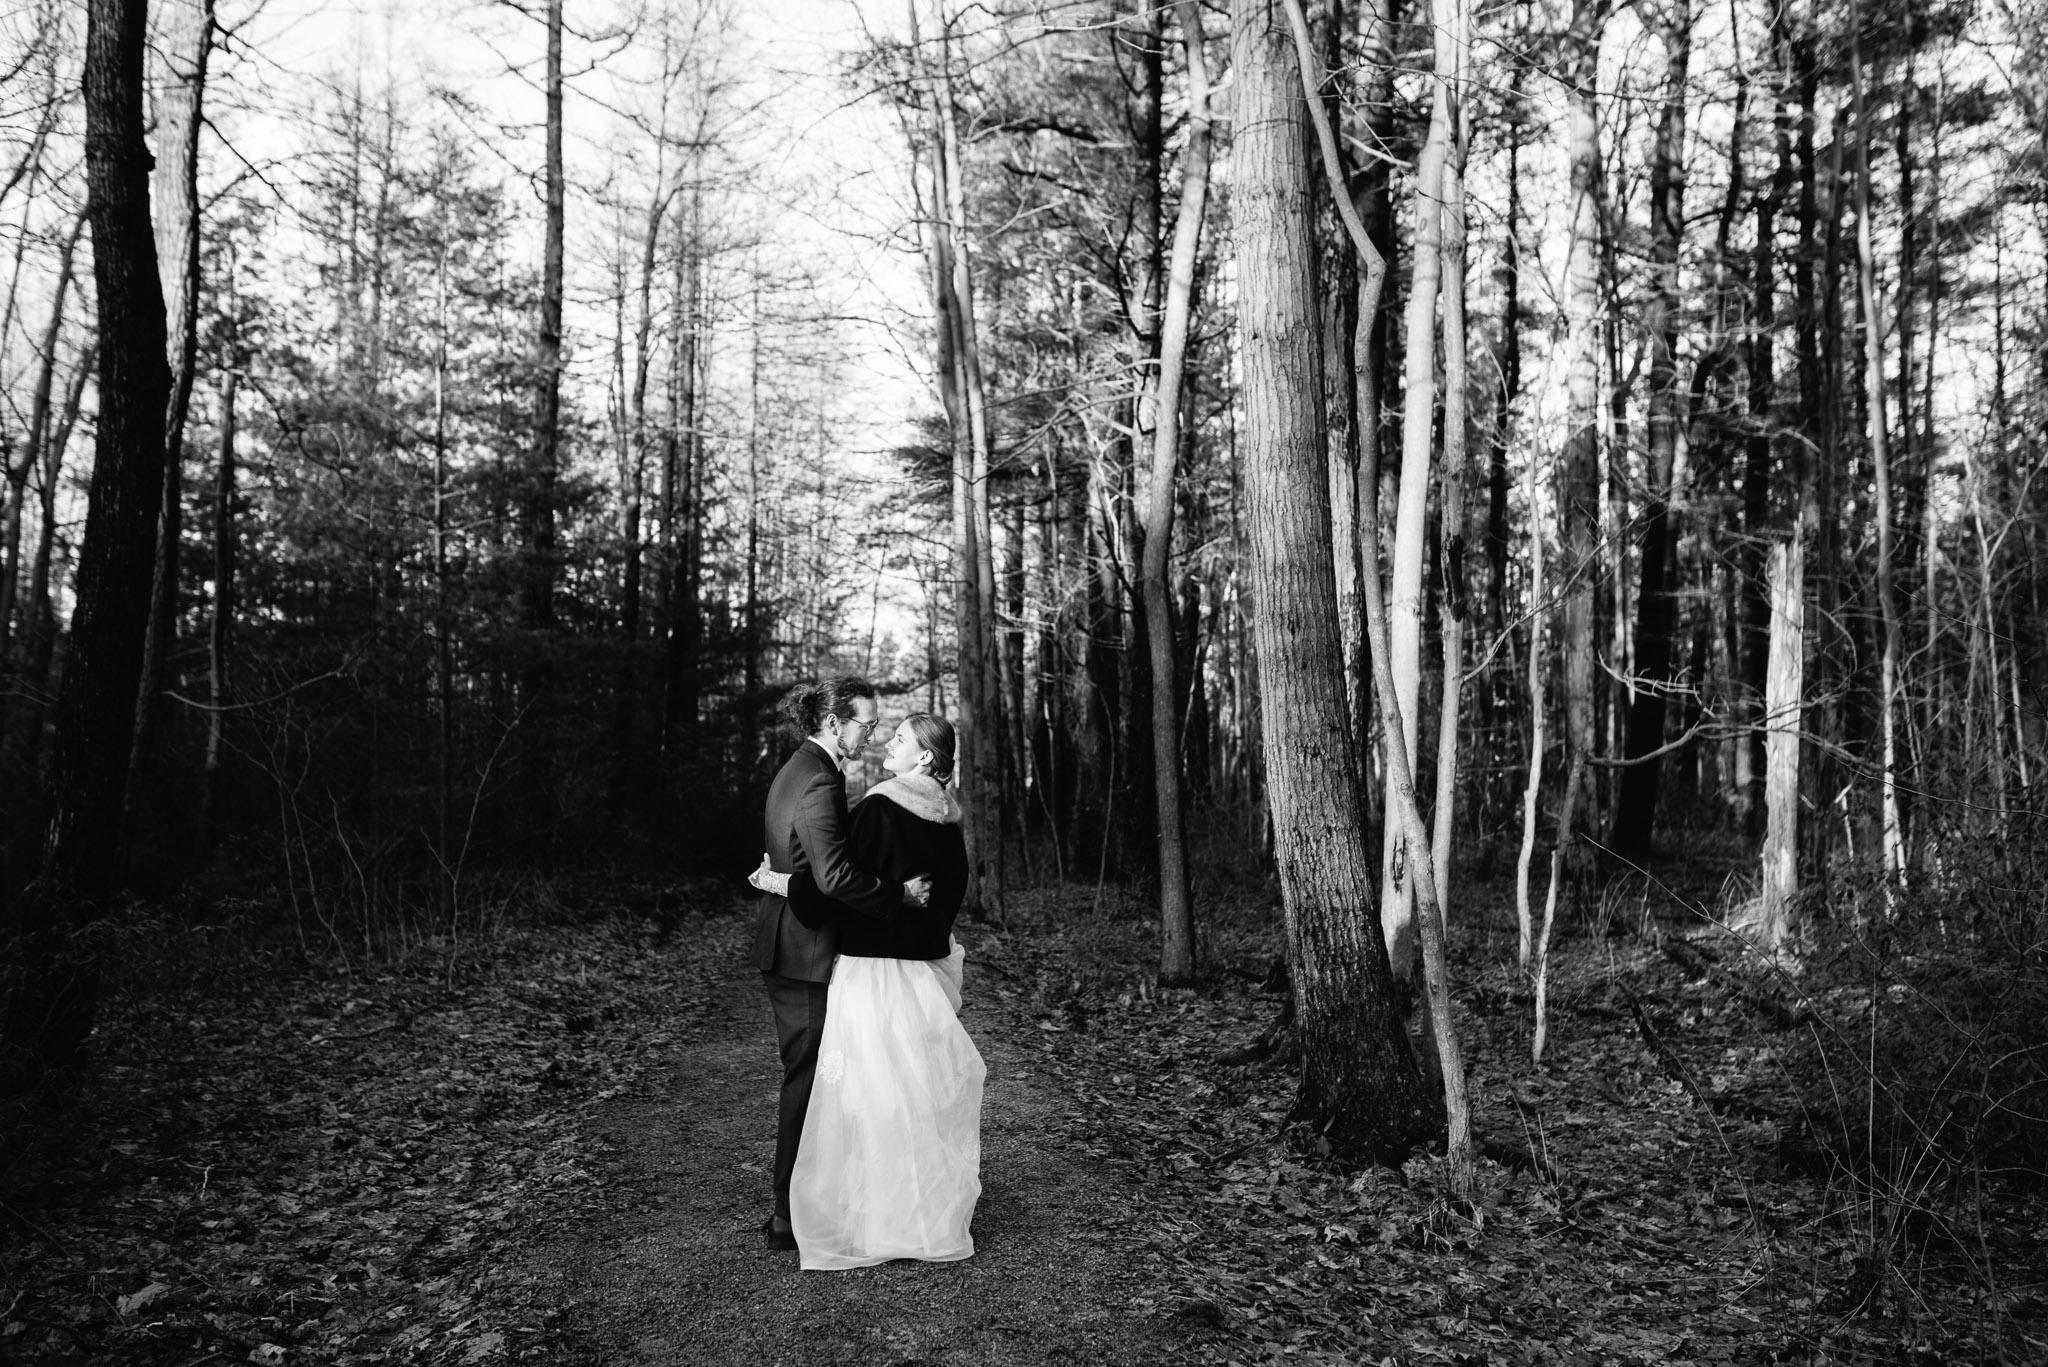 Wedding Couples portrait, Ligonier Wedding Photographer, Ligonier PA wedding, wedding potraits-6859.jpg